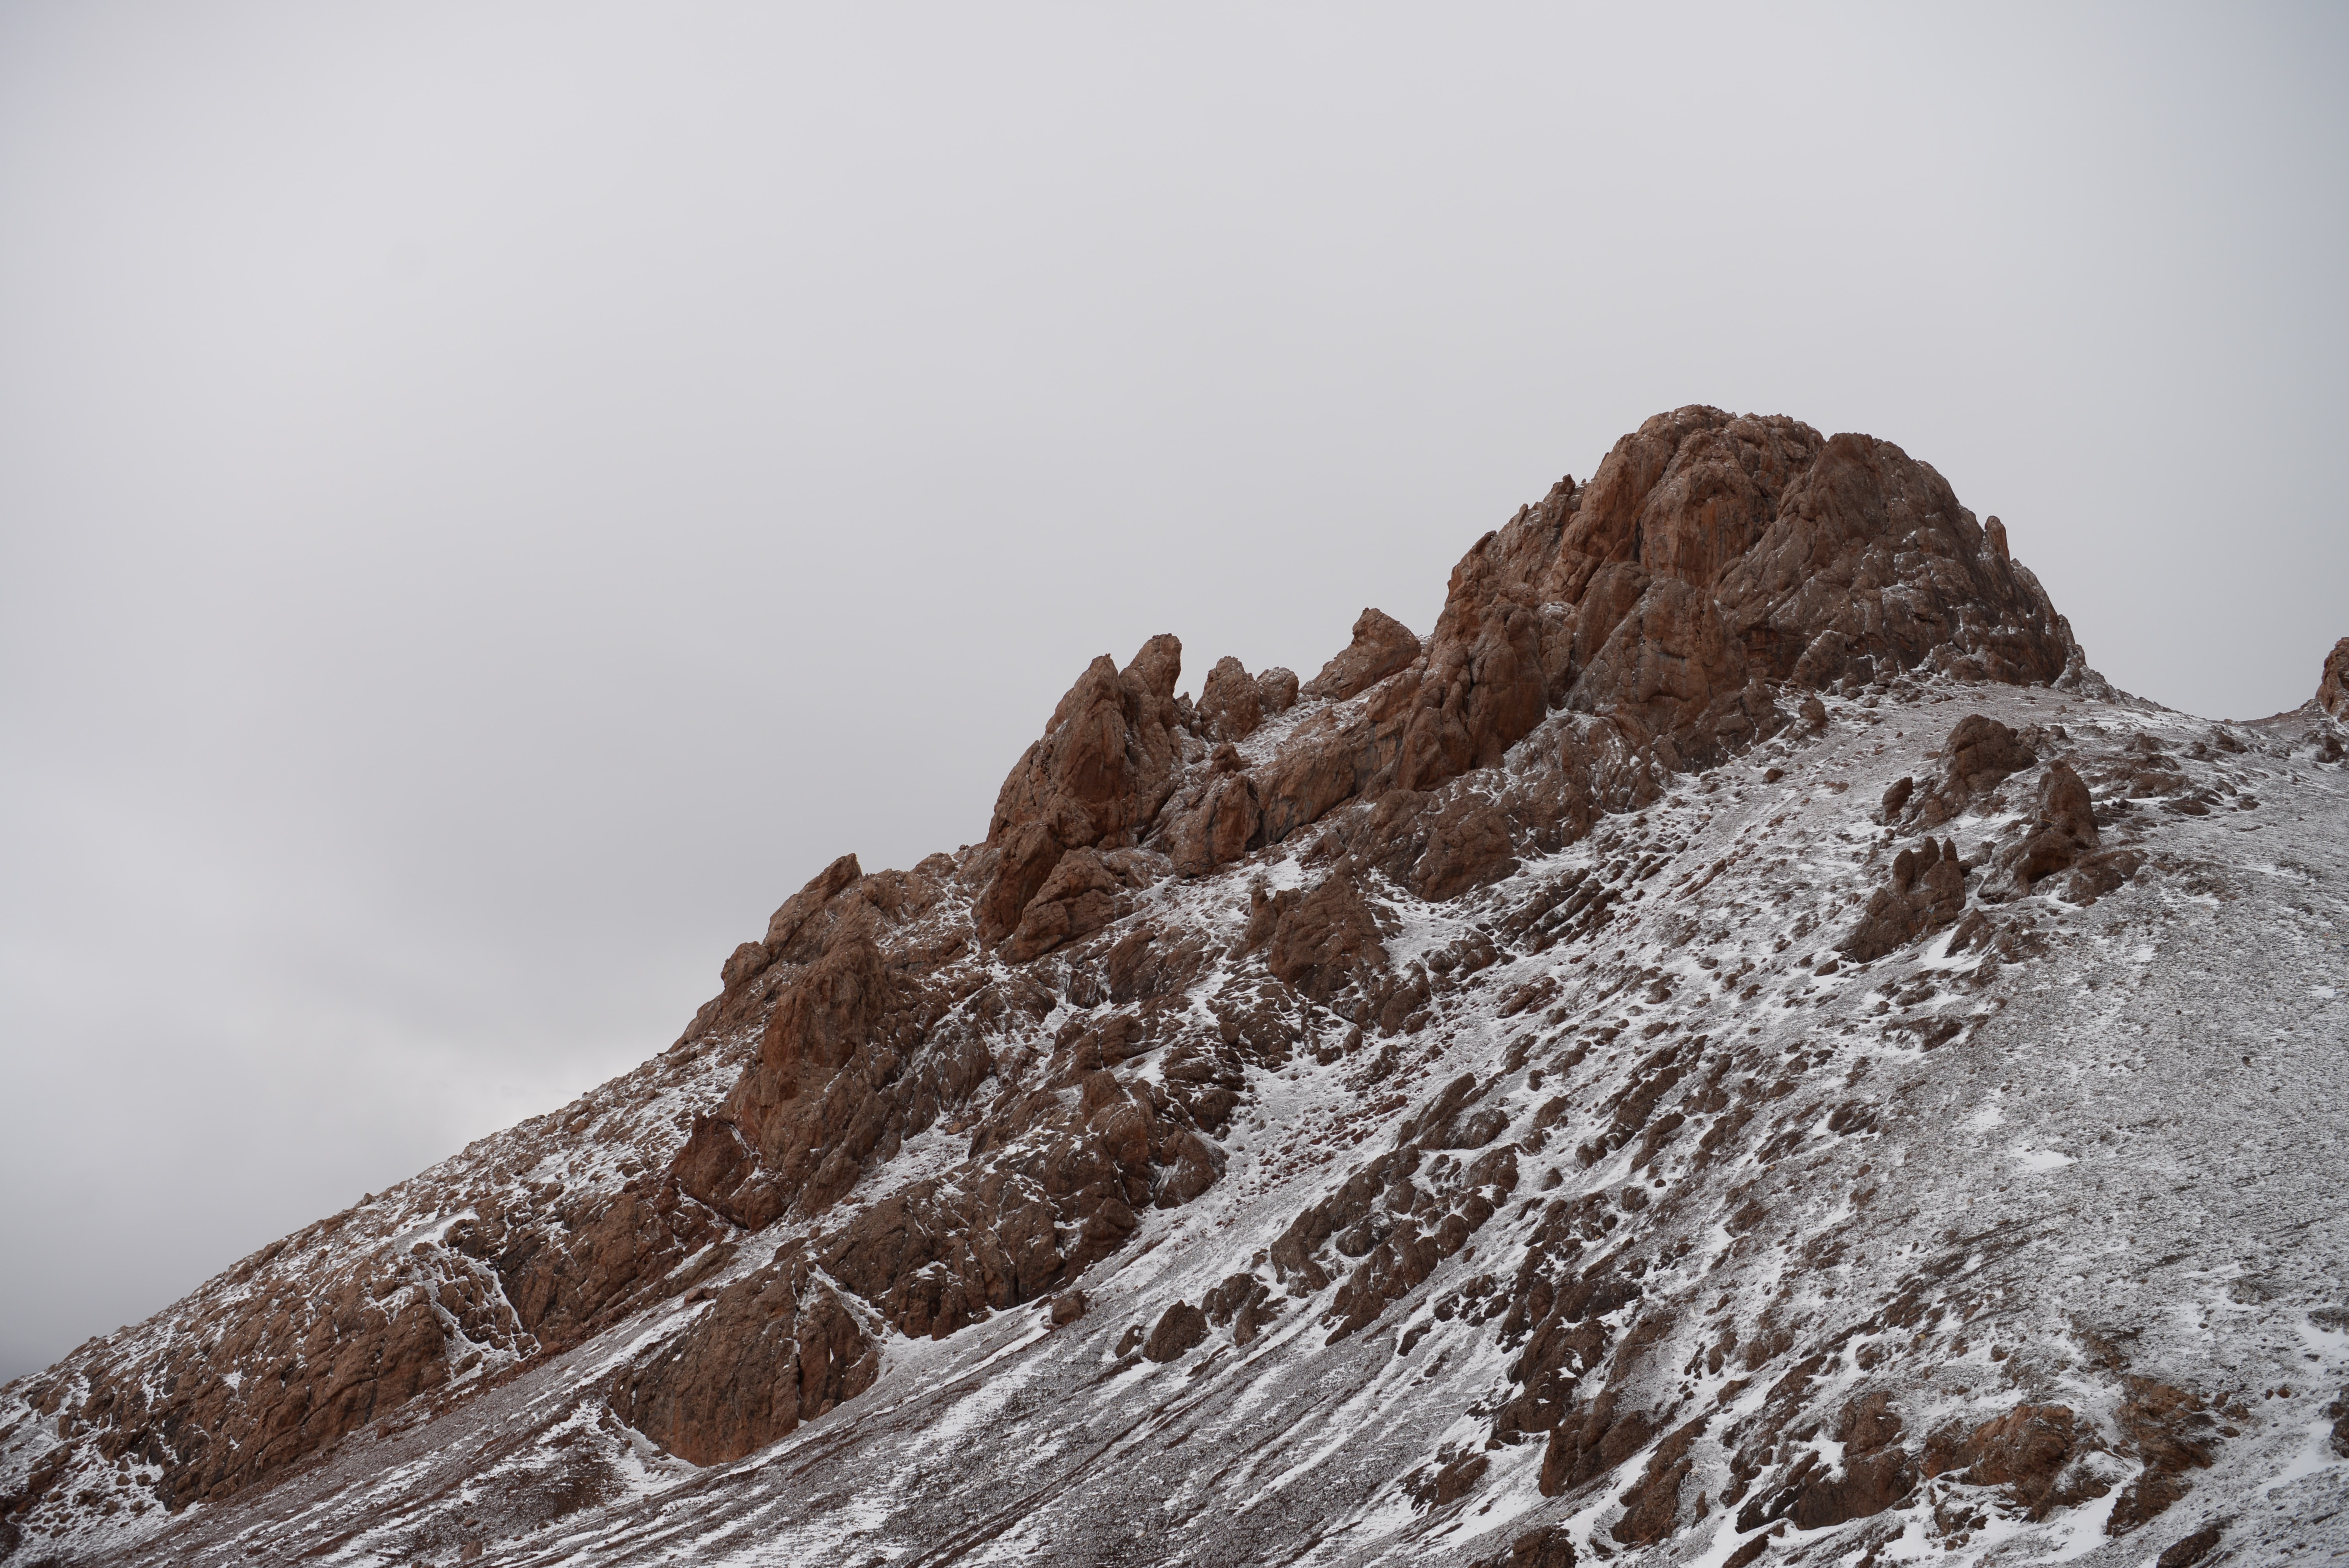 A rugged mountain peak in Tibet